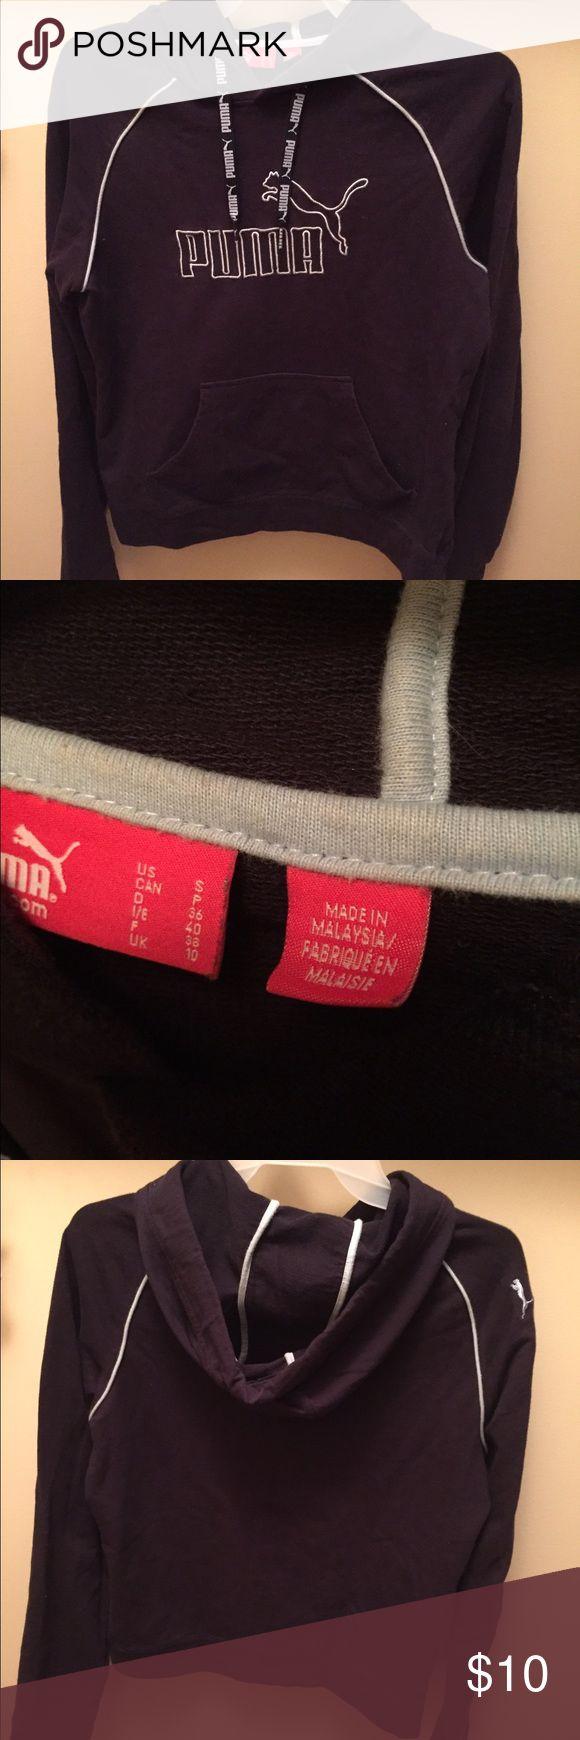 Puma sweatshirt Gently worn Puma sweatshirt. It's definitely a small. Puma Tops Sweatshirts & Hoodies